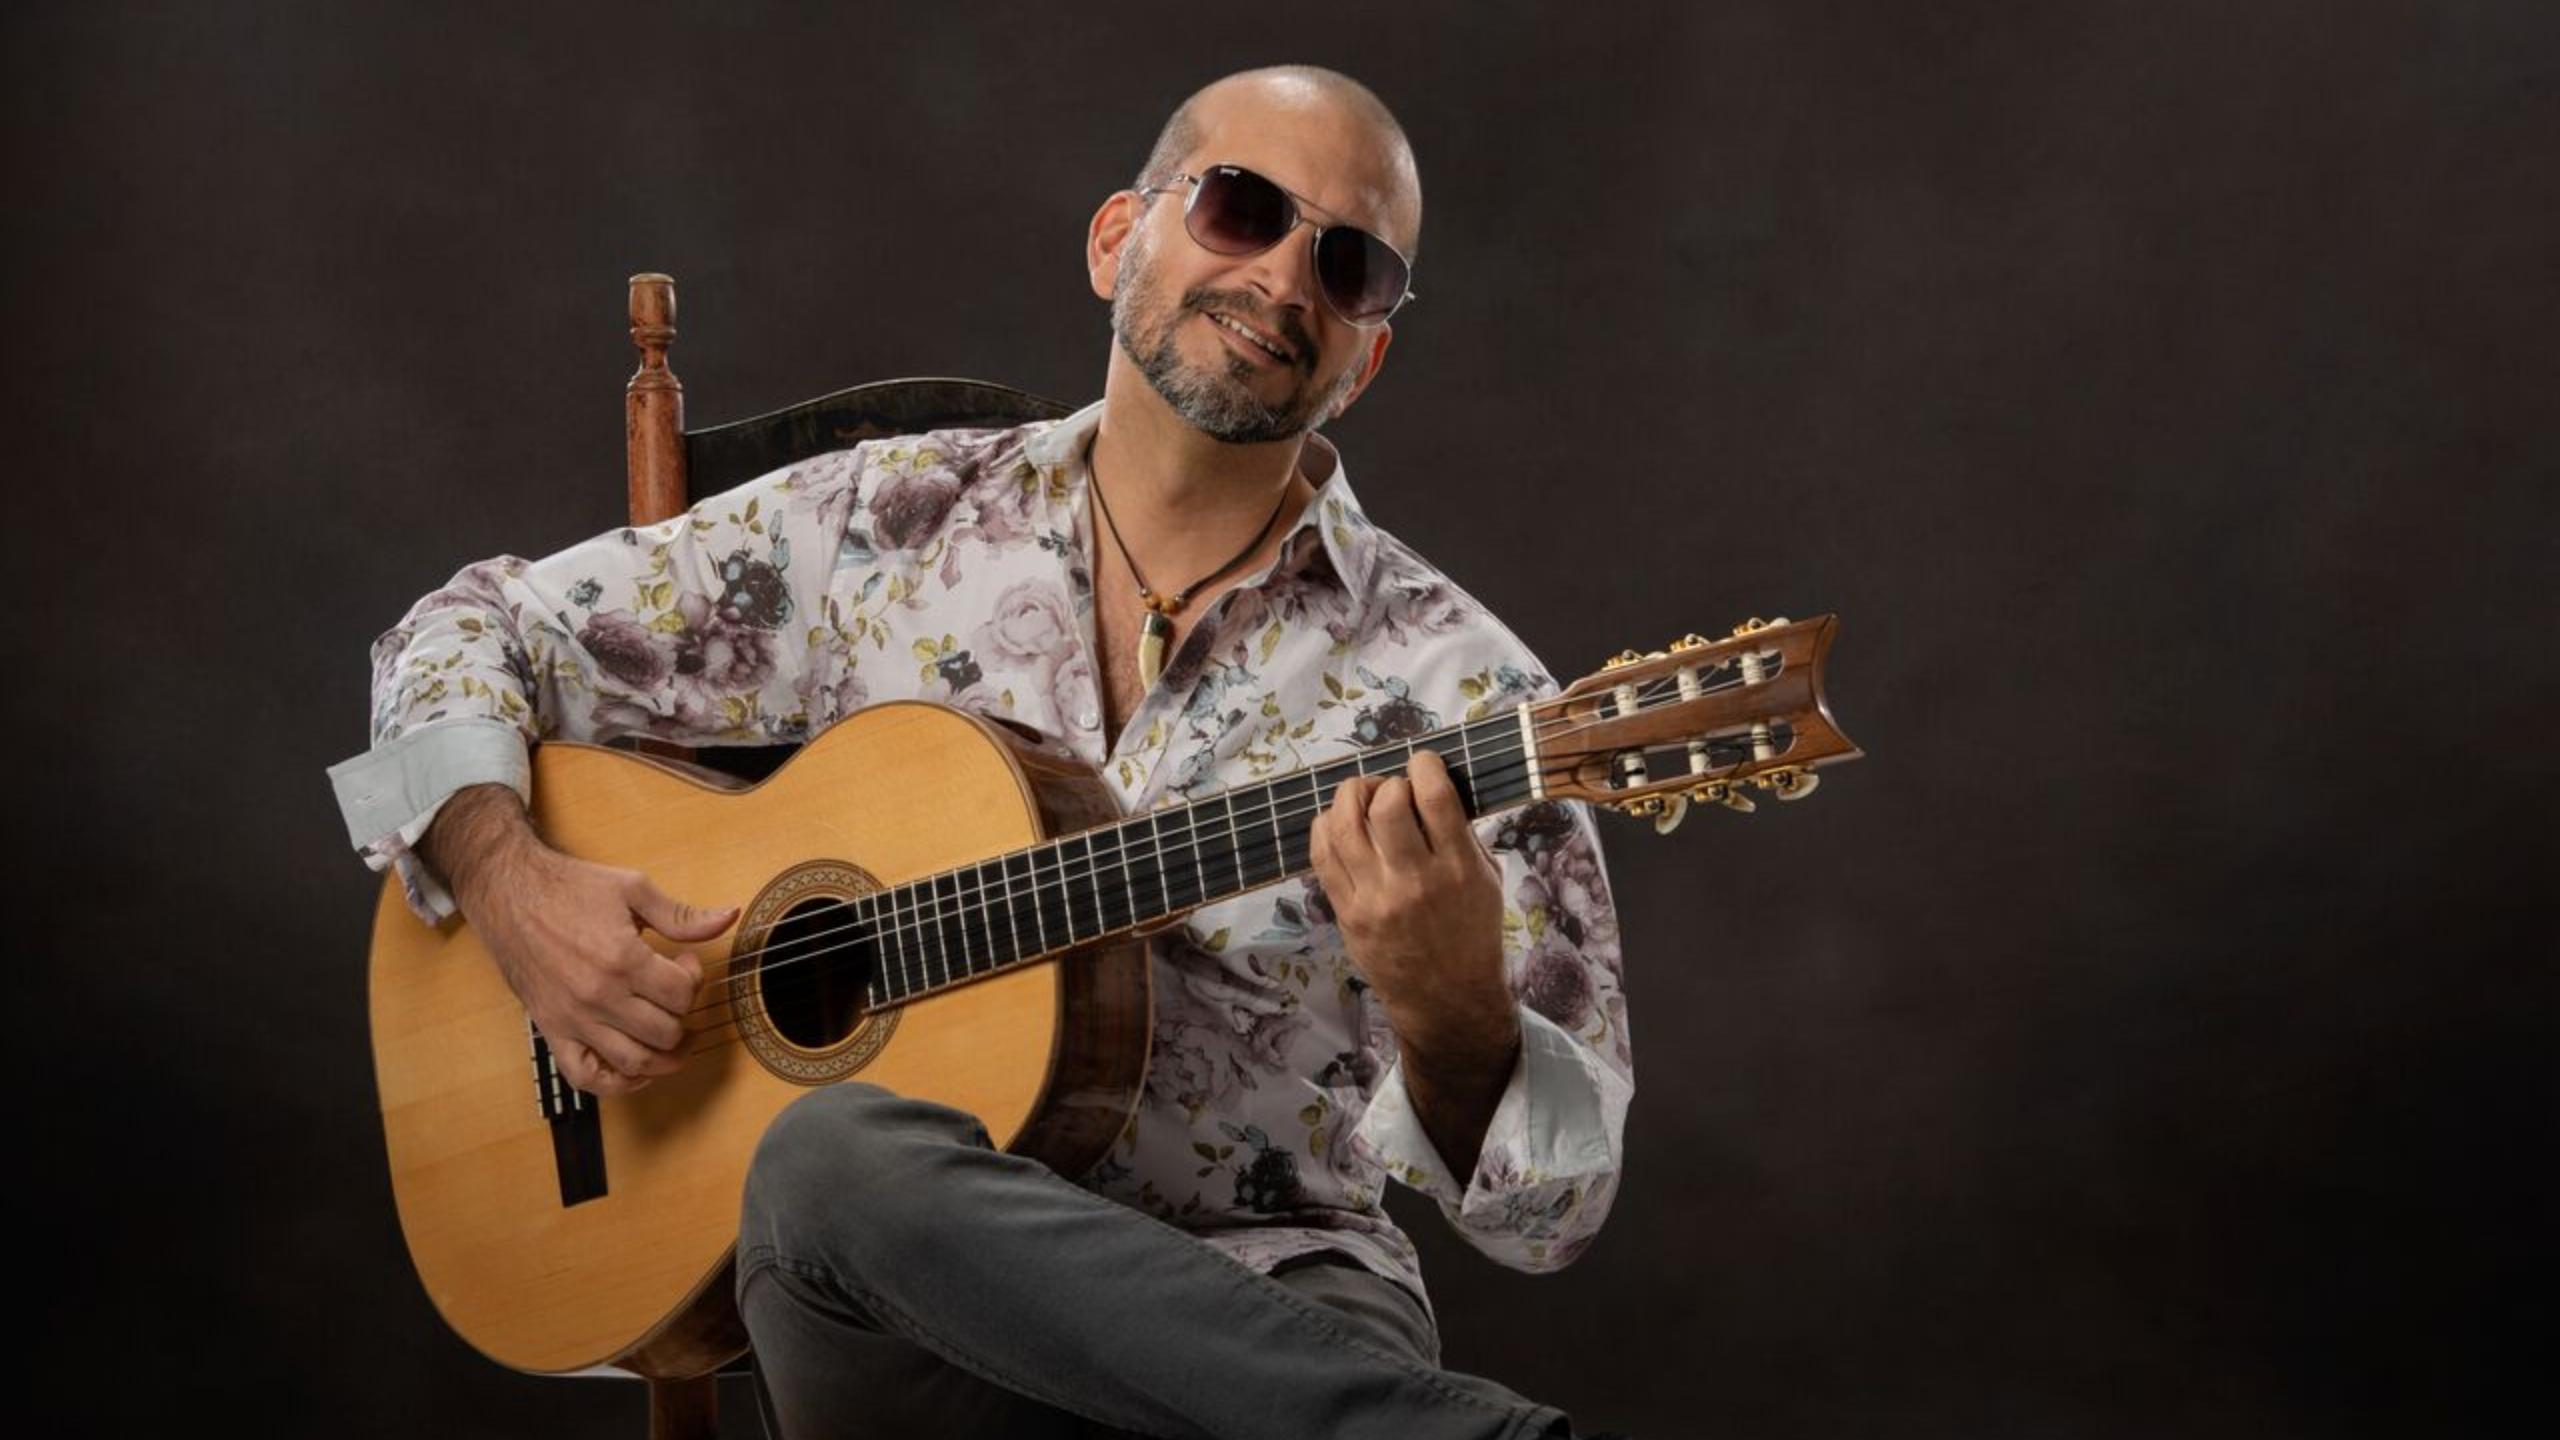 David Munoz, guitarist, plays during Sunday Brunch